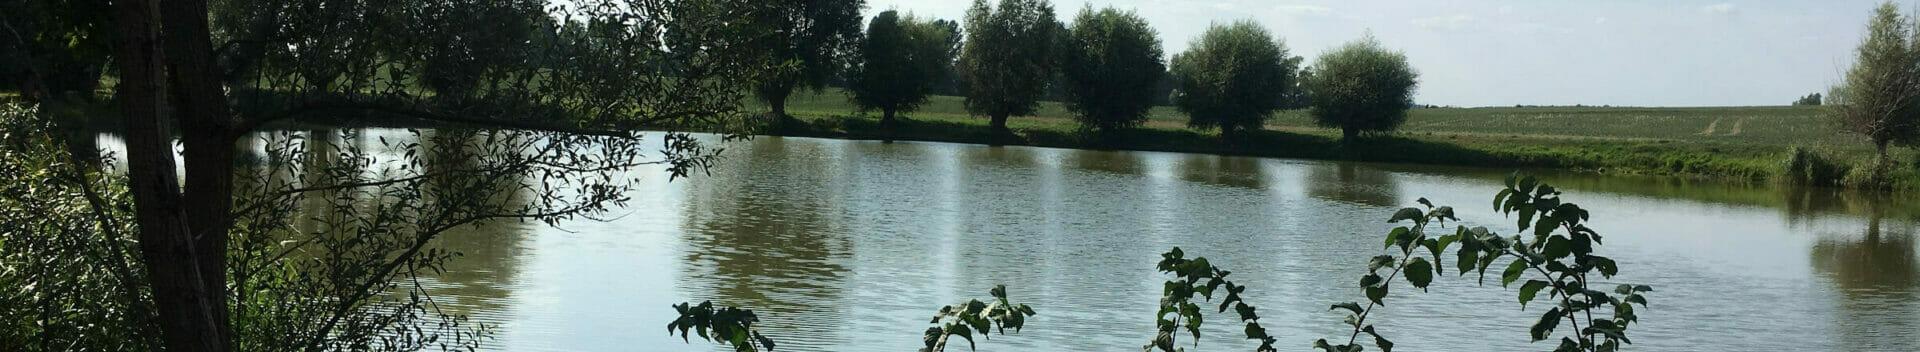 Pessin - Havellandradweg - Havelland